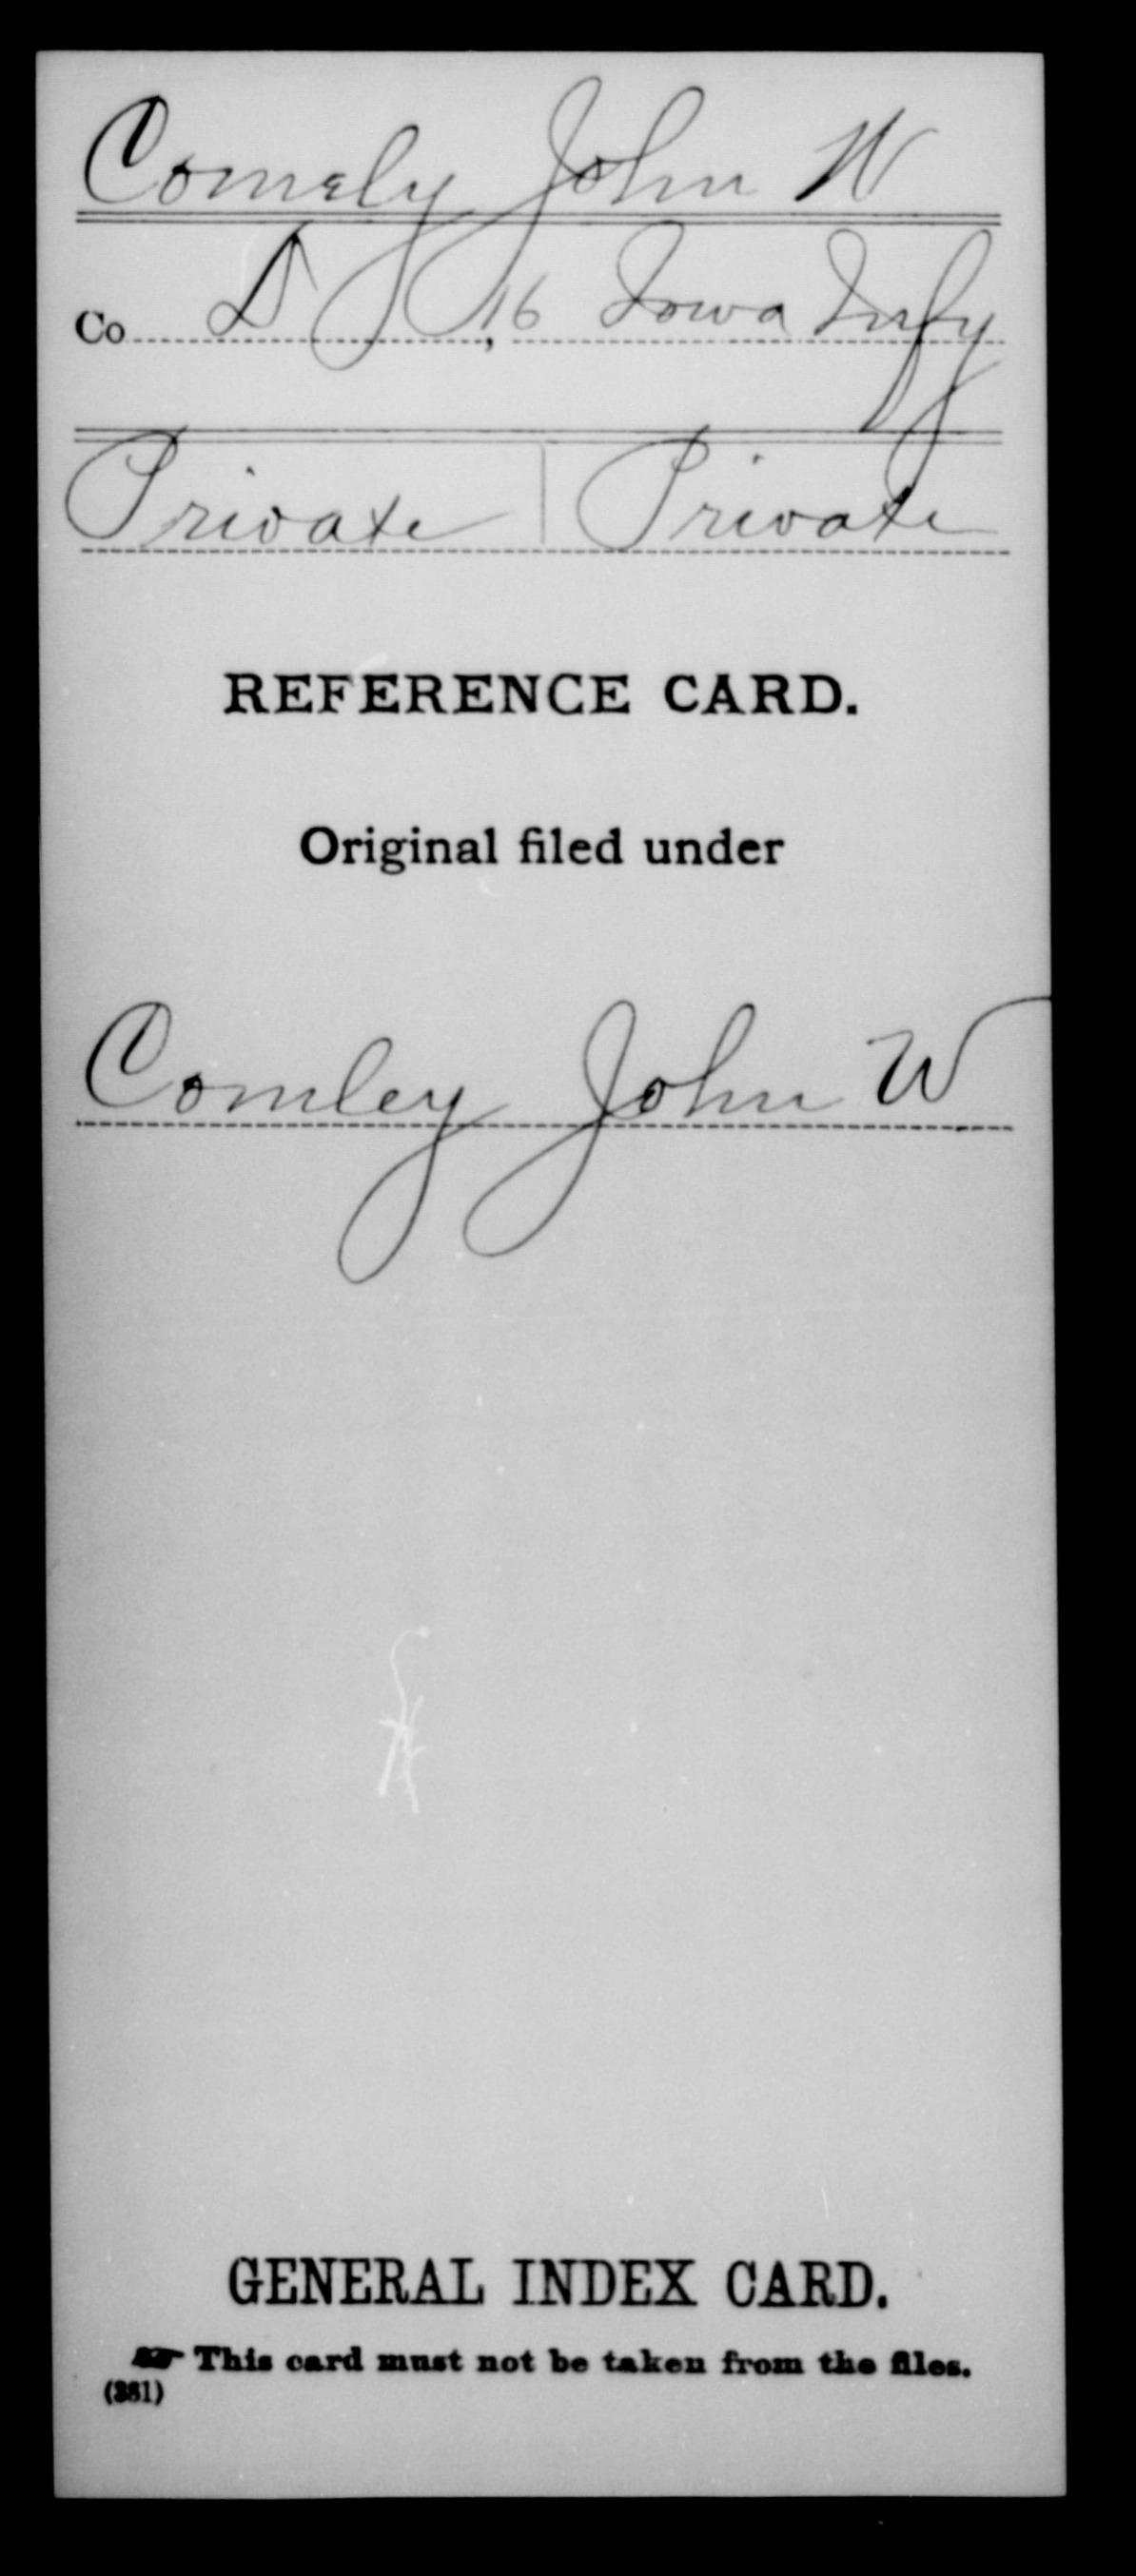 [Iowa] Comely, John W - 16th Infantry, Company D